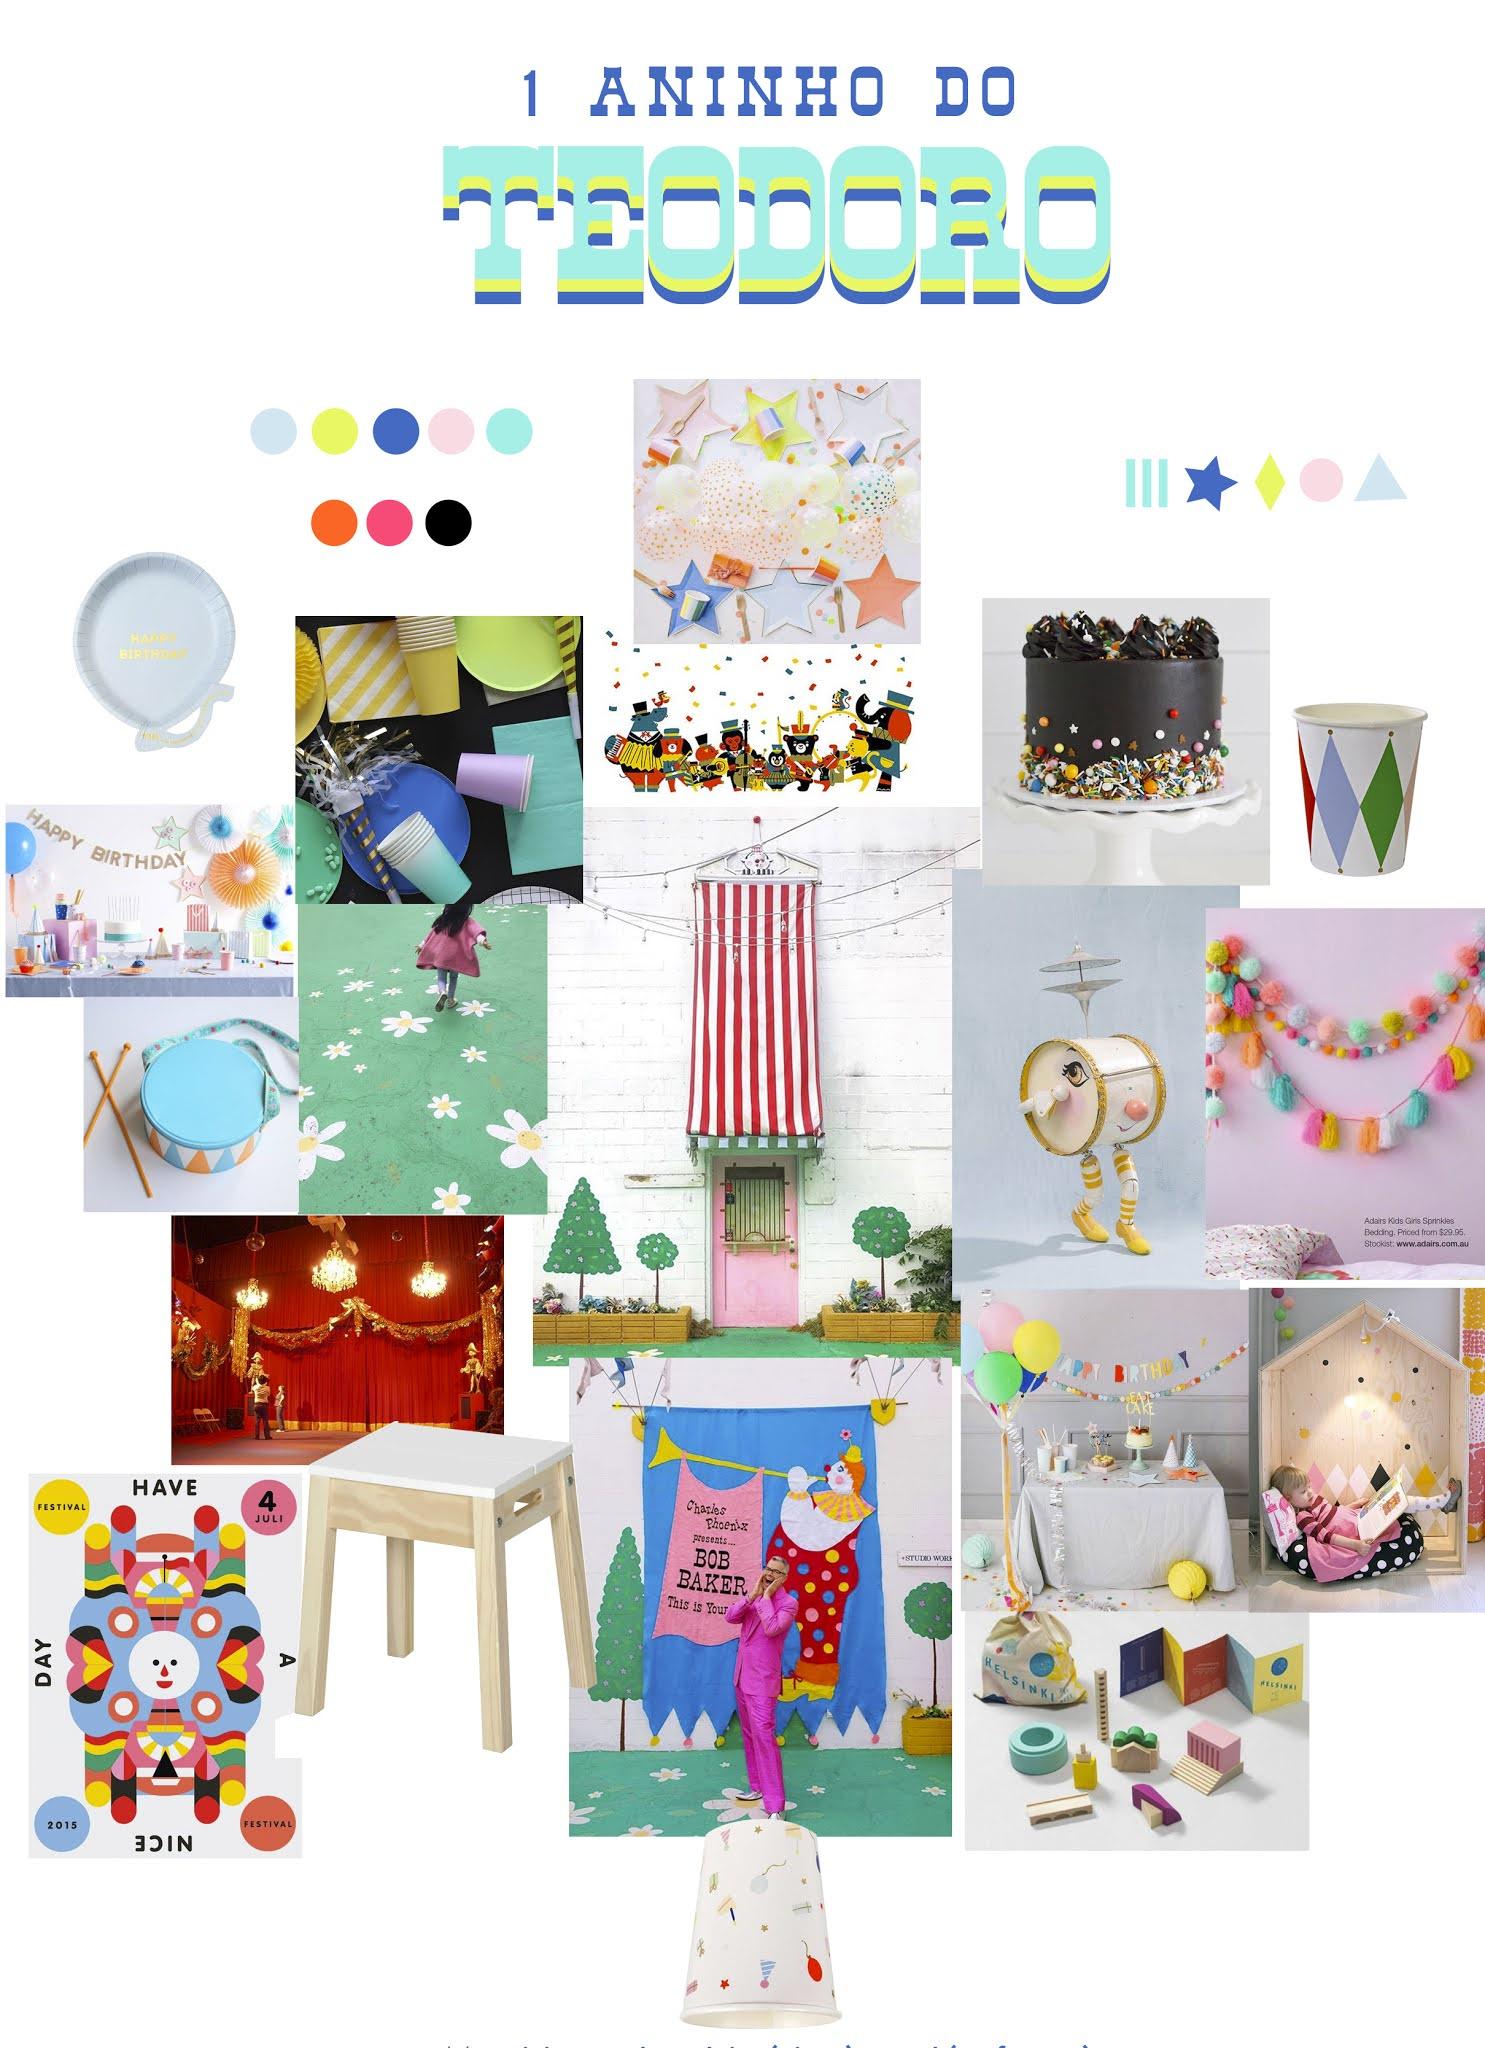 decoracao simples e barata festa aniversario infantil 1 ano colorida temas criativos masculinos menino teatro marionetes musica blog do math br